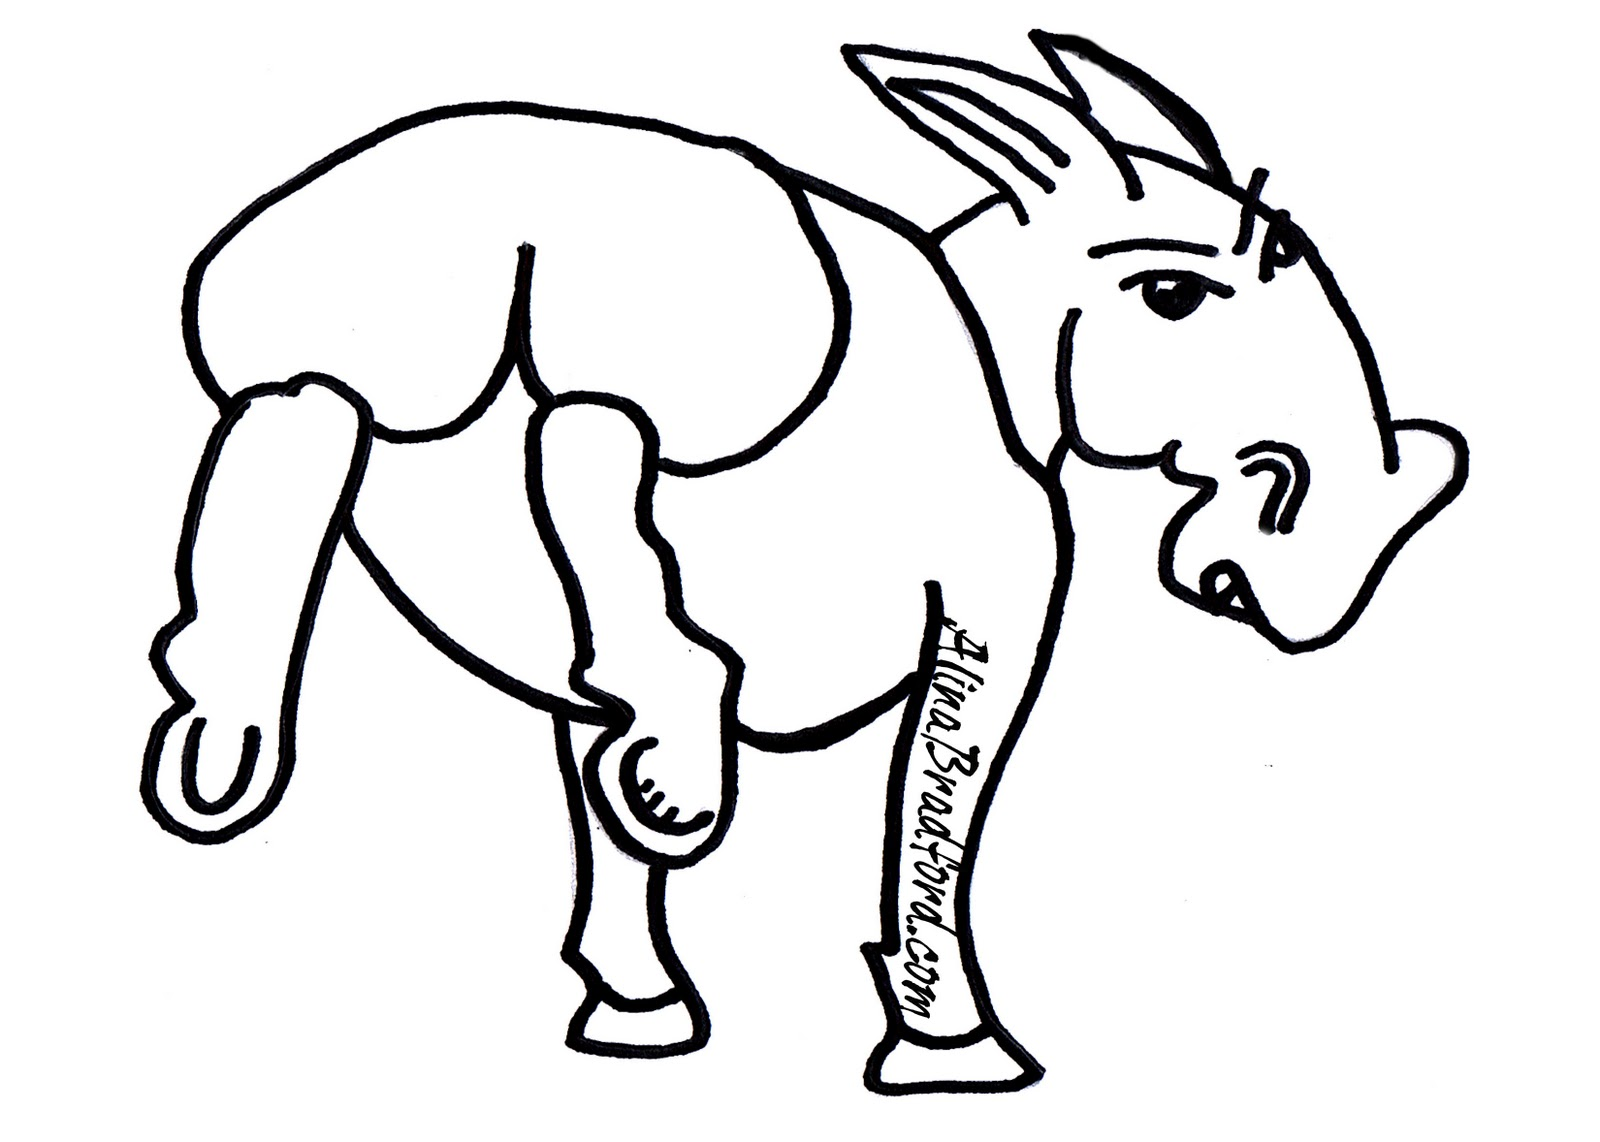 honkey donkey coloring pages - photo#15